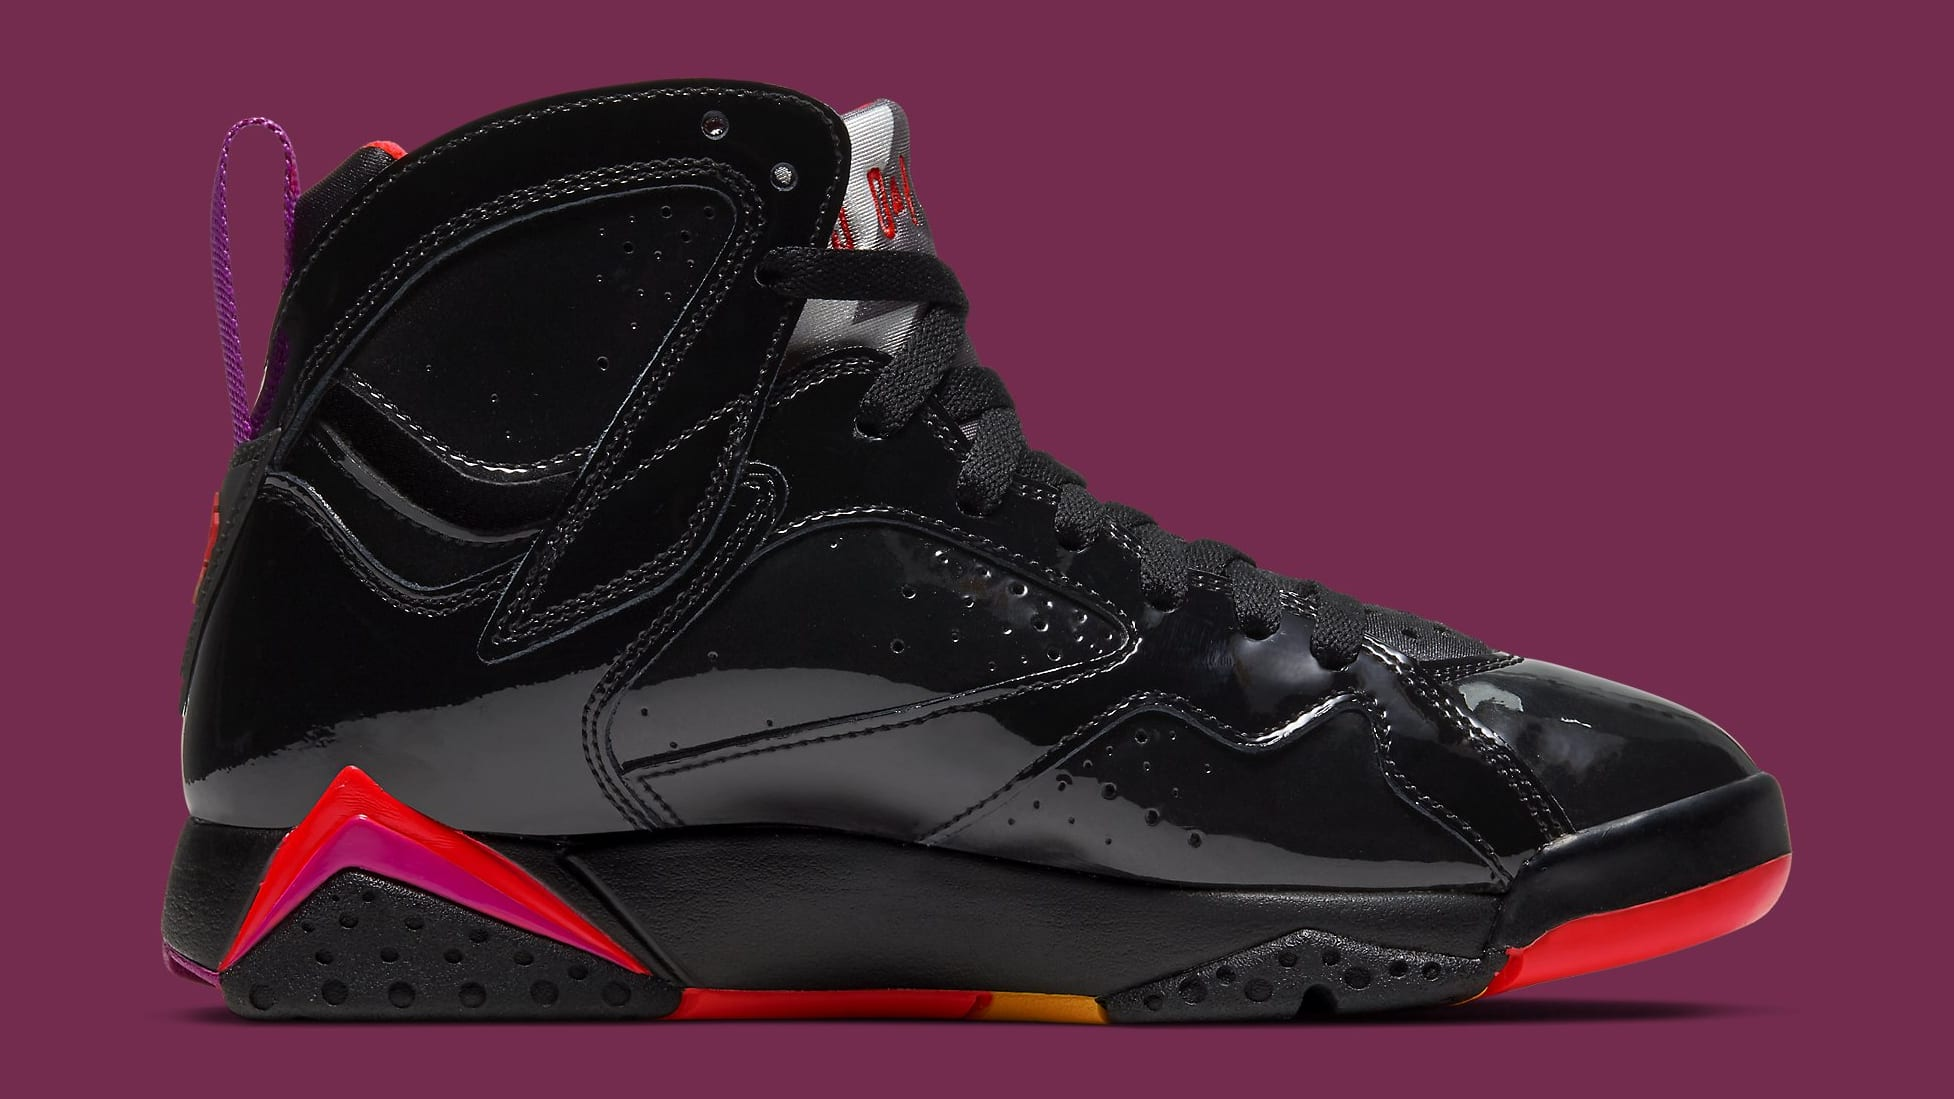 Air Jordan 7 Retro WMNS 'Black Patent Leather' 313358 006